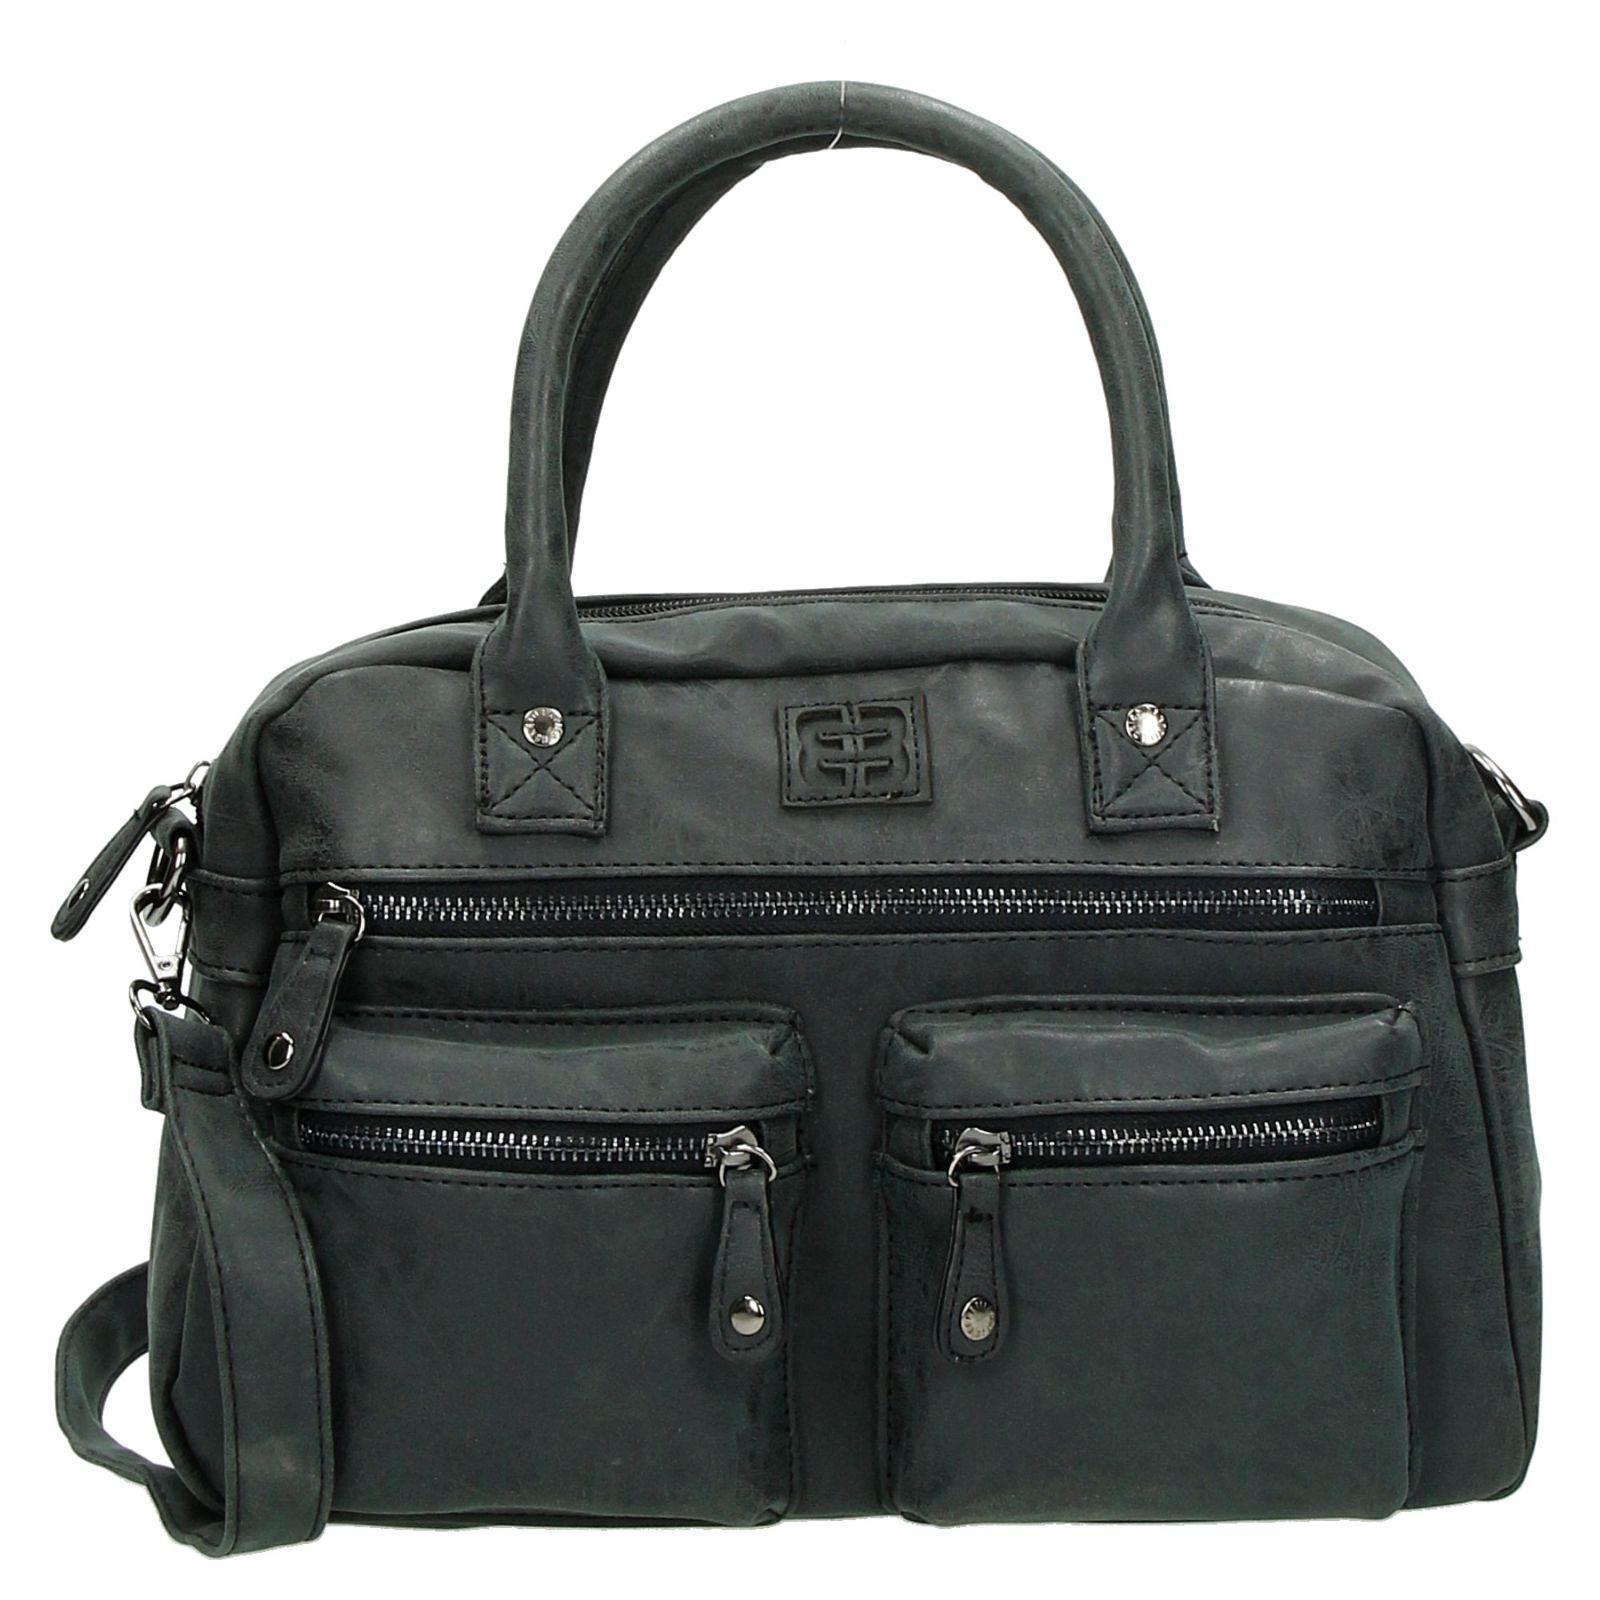 4962730fdf6 enrico benetti dames tas jura 66045 zwart - JvS Bags